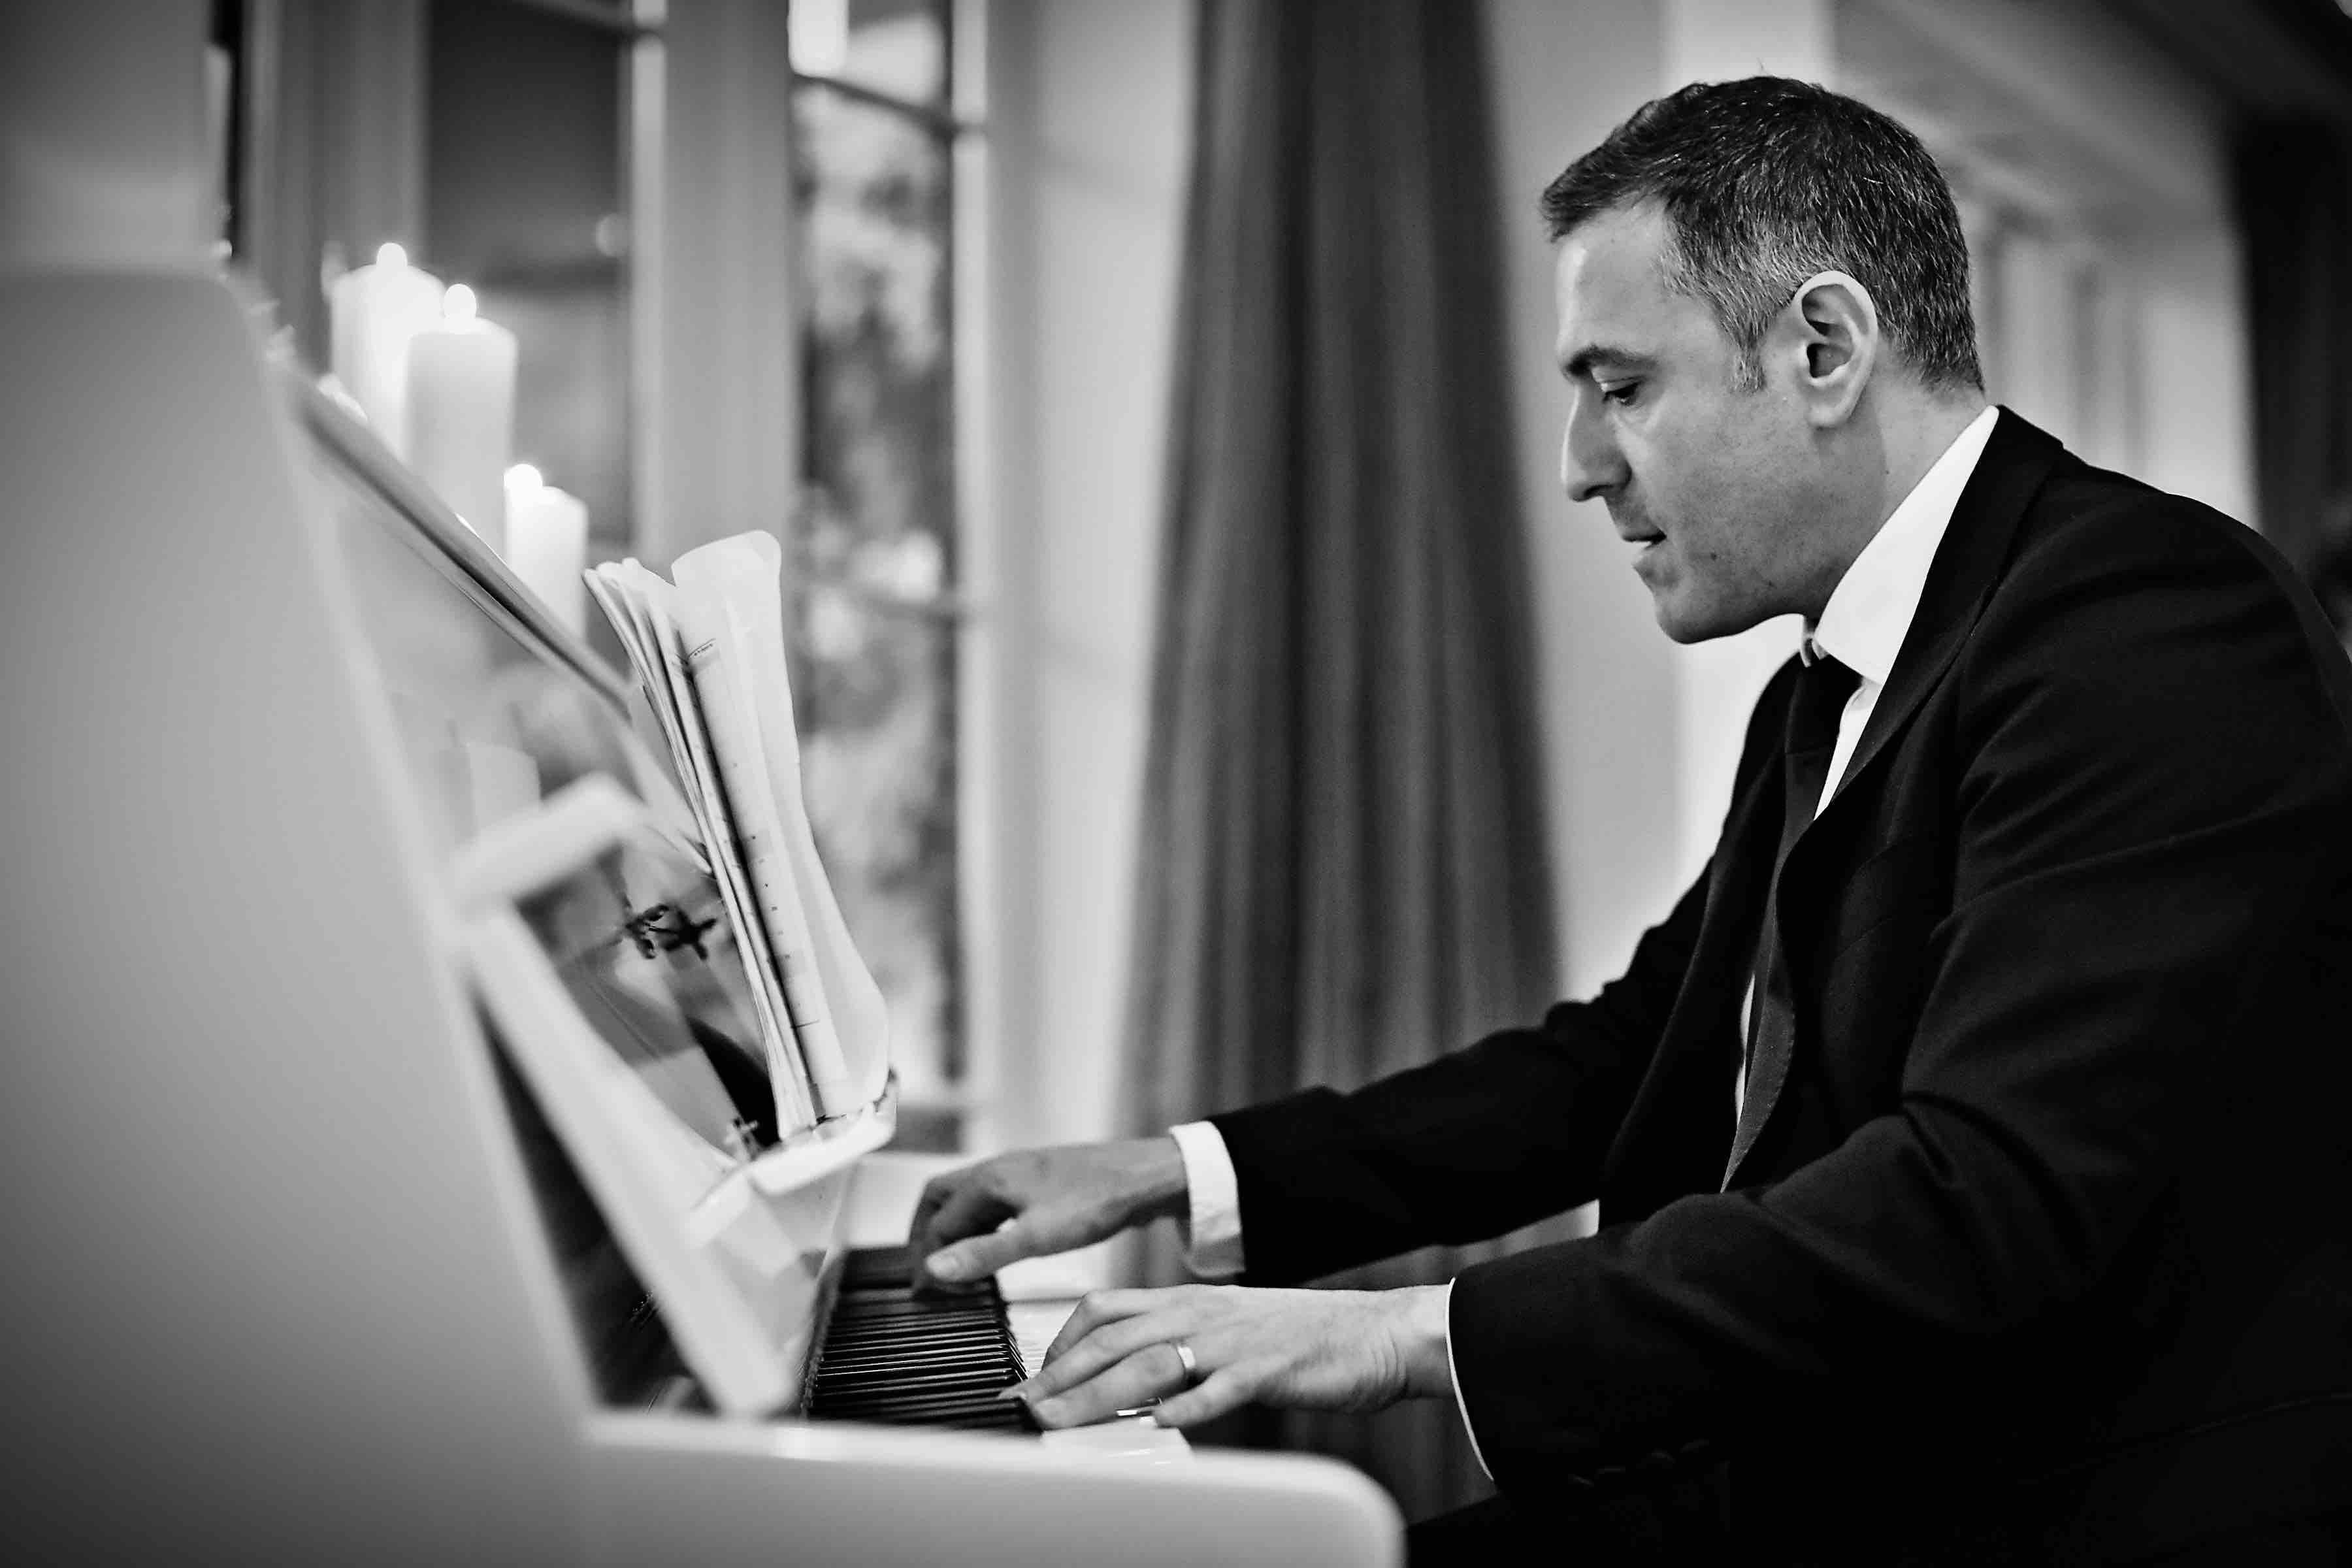 Pianist London - Bryan Edery